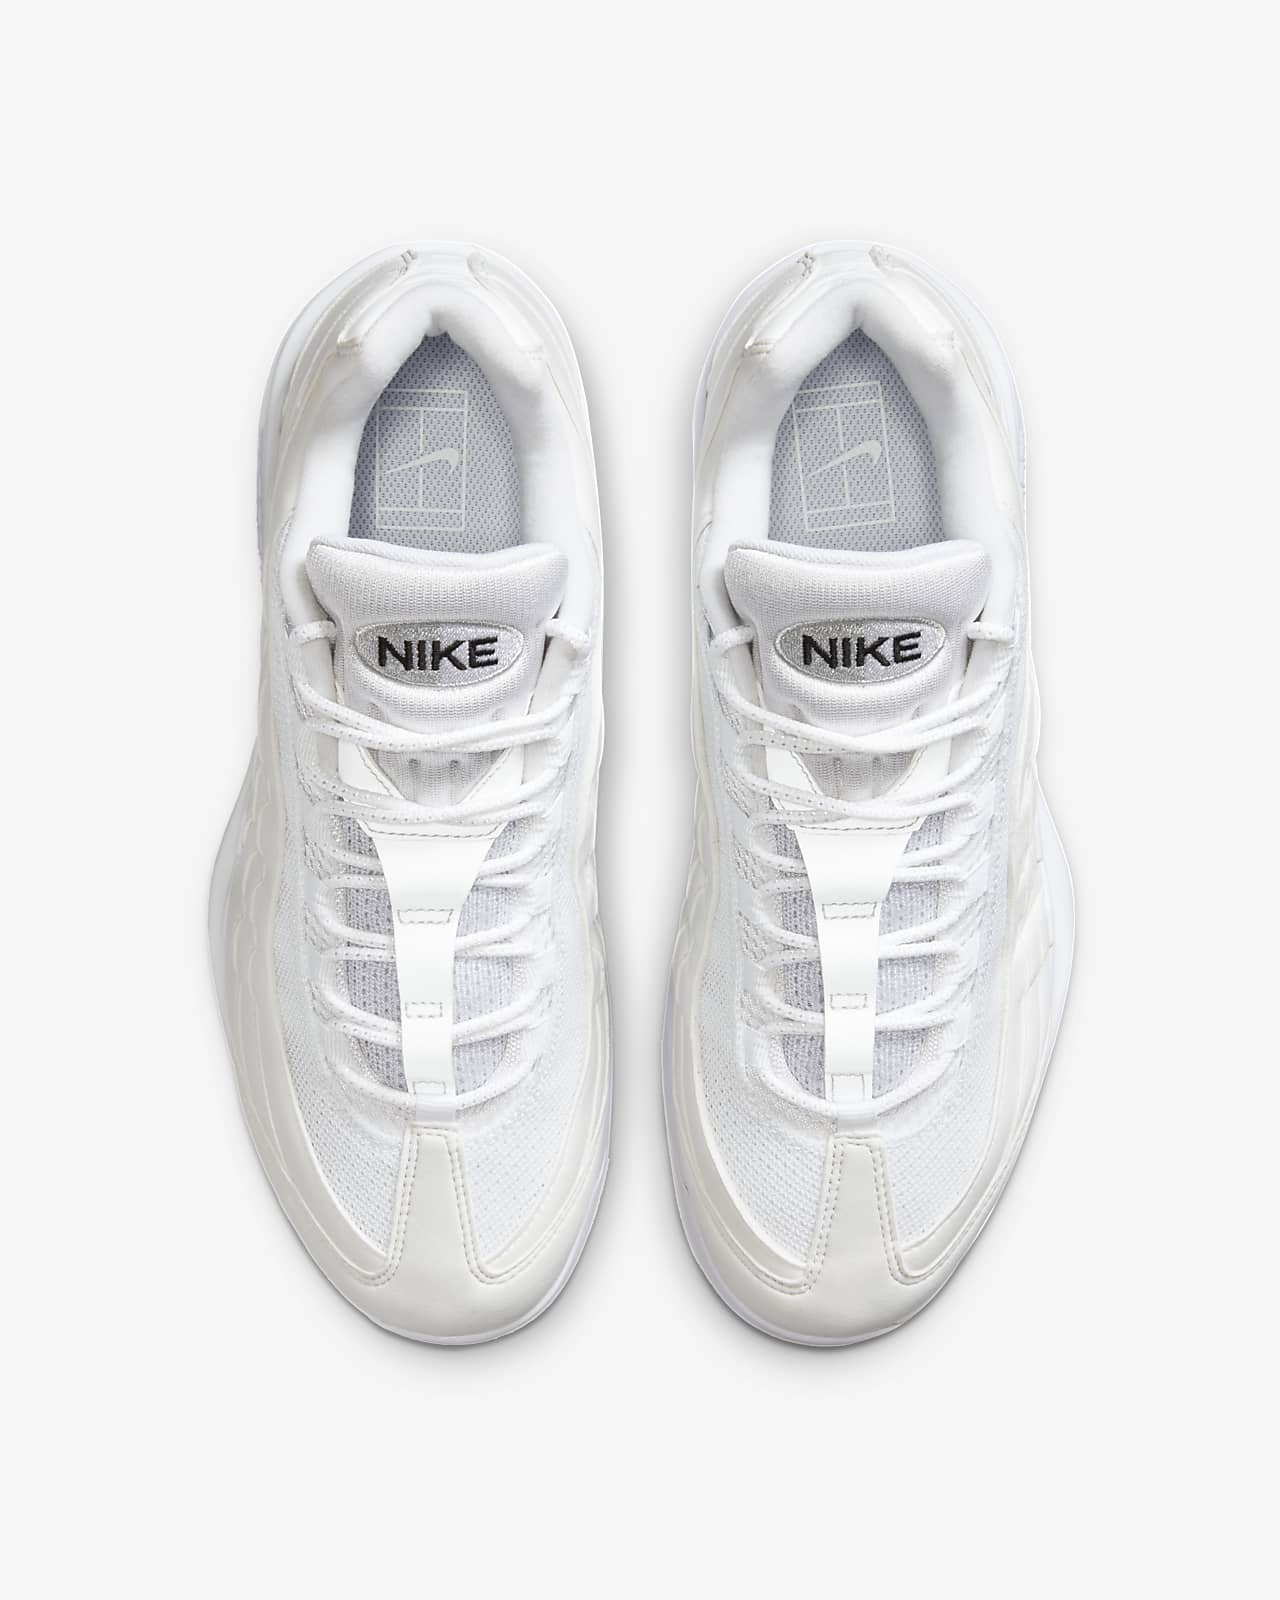 NikeCourt Zoom Vapor X Air Max 95 Men's